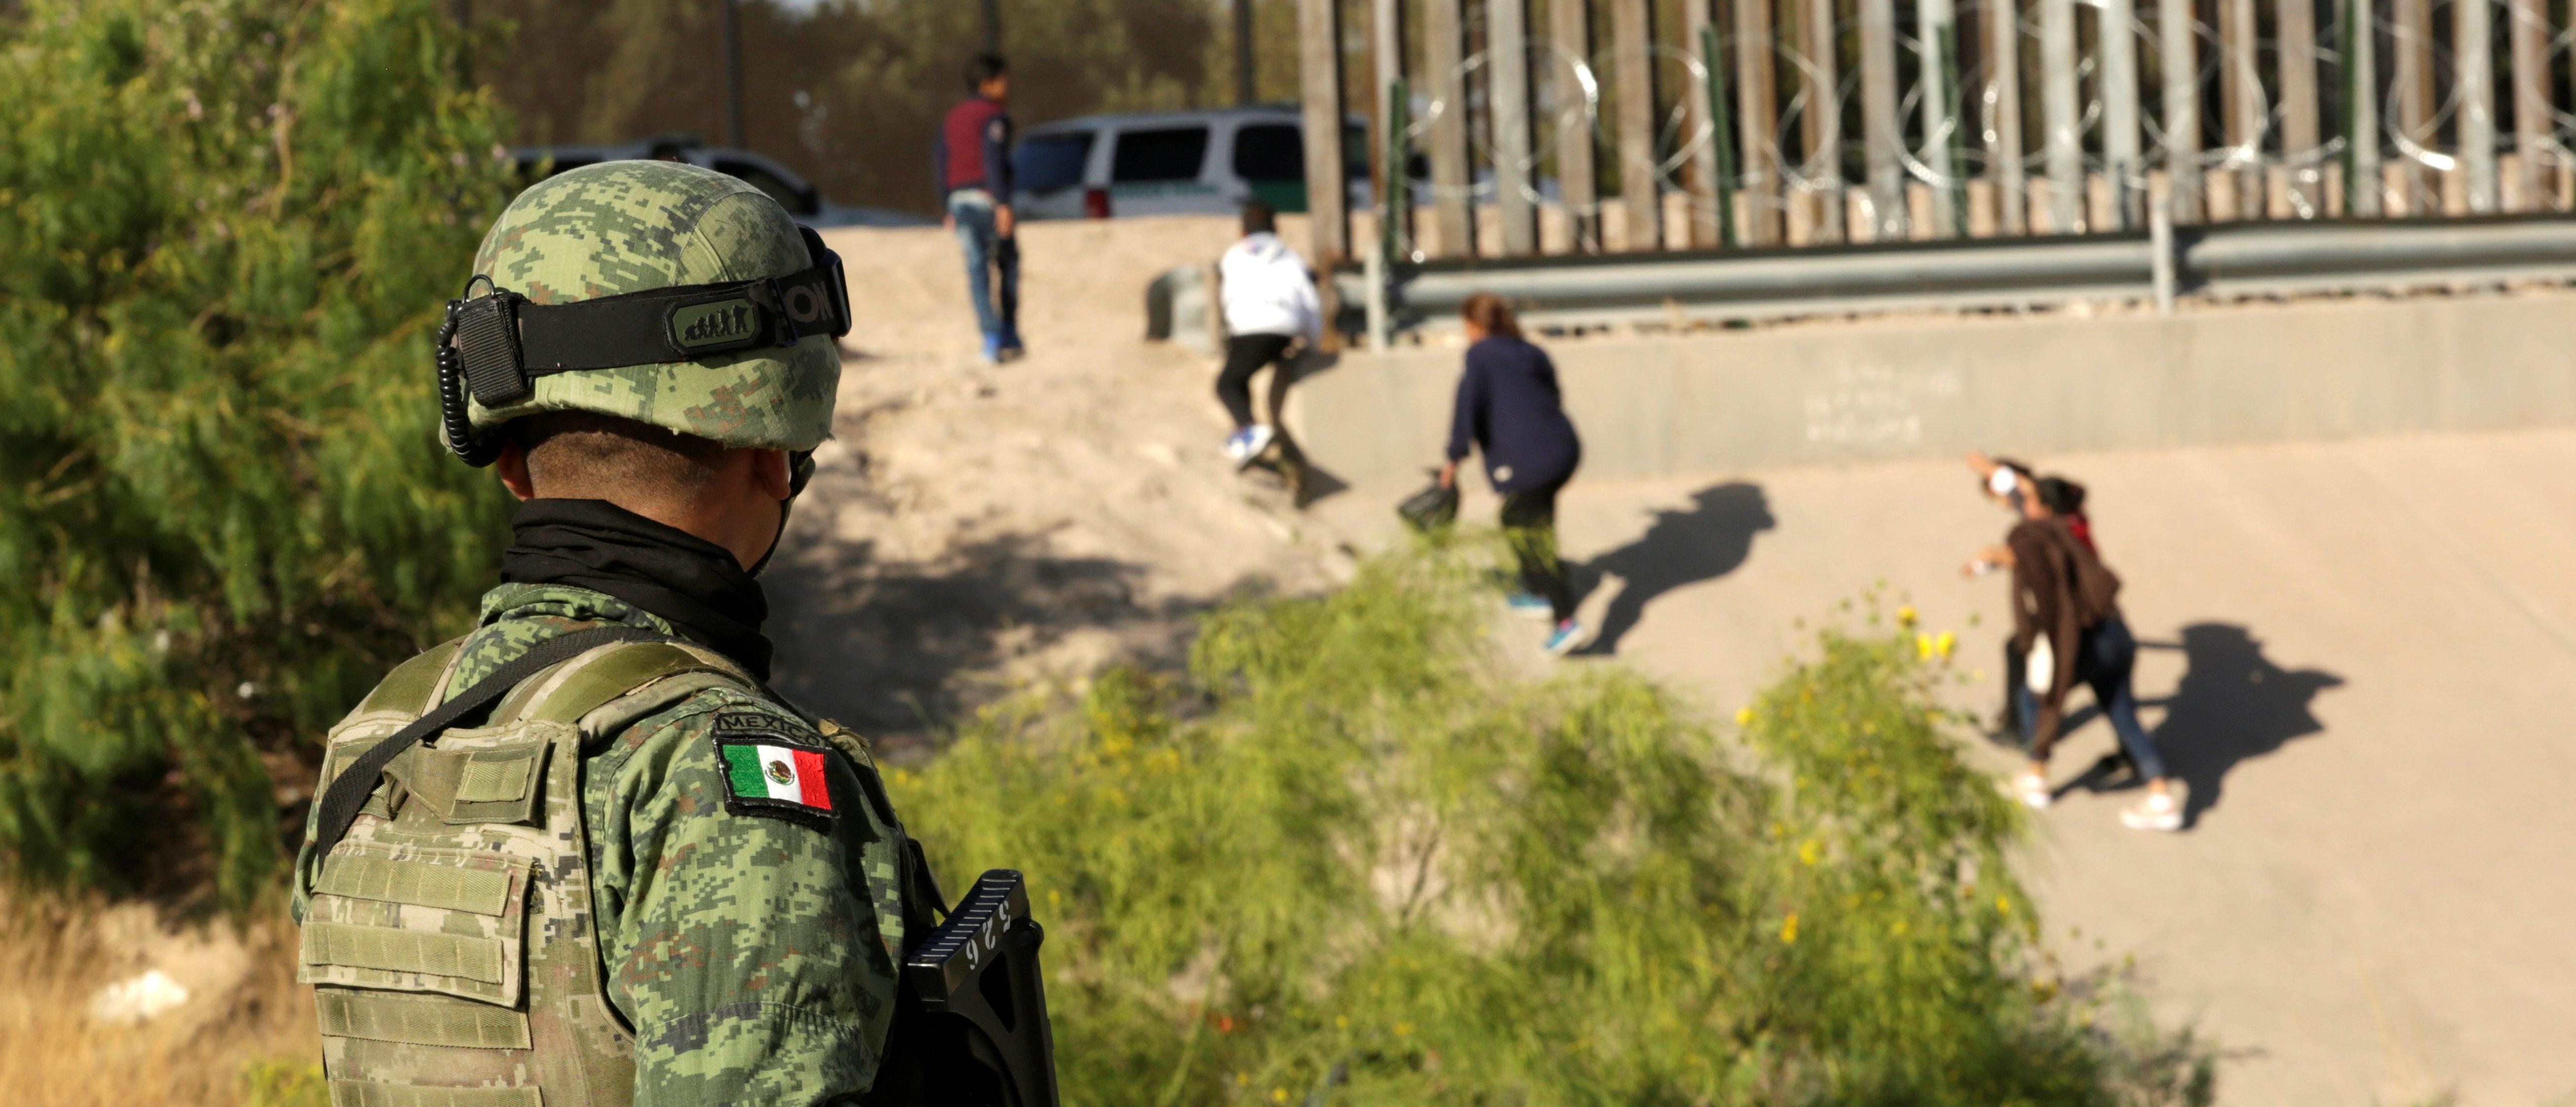 A member of the National Guard looks at migrants that crossed illegally into El Paso, Texas, U.S., from Ciudad Juarez, in Ciudad Juarez, Mexico June 19, 2019. REUTERS/Jose Luis Gonzalez